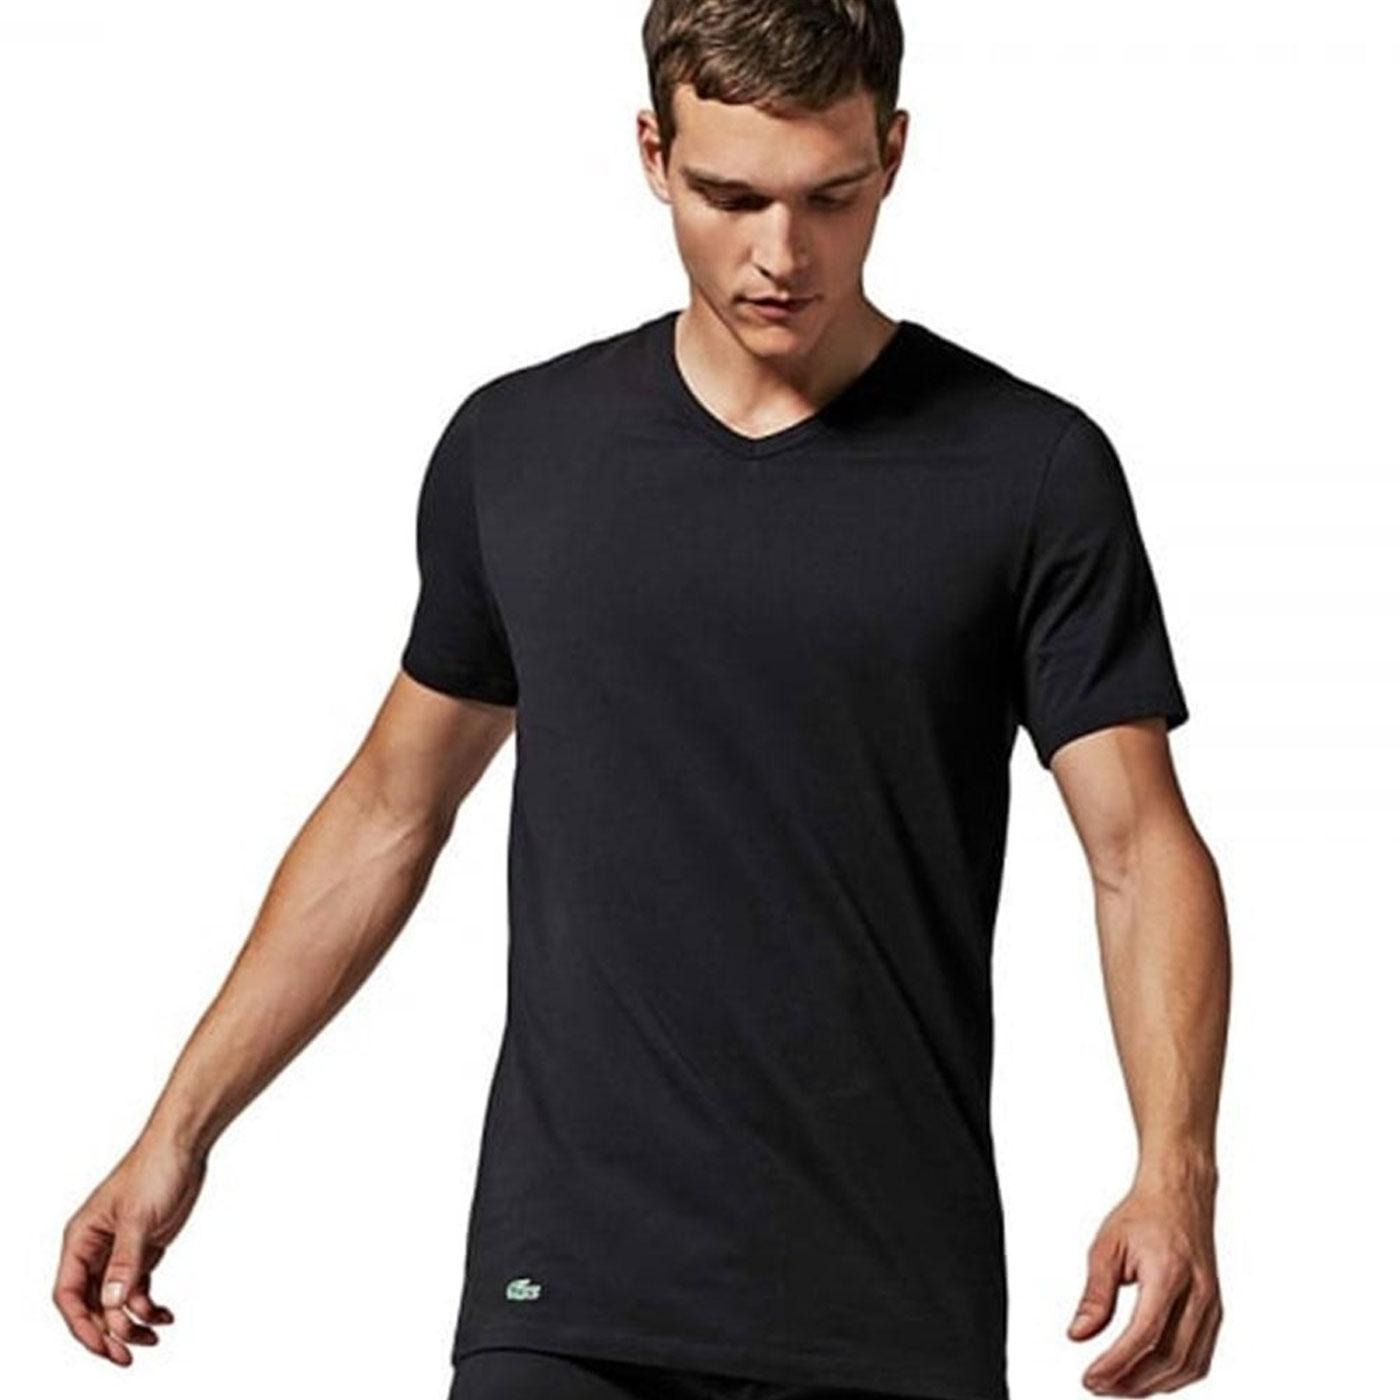 Discounter bieten eine große Auswahl an Geschäft LACOSTE Men's 2 Pack Crew Neck T-Shirt - BLACK